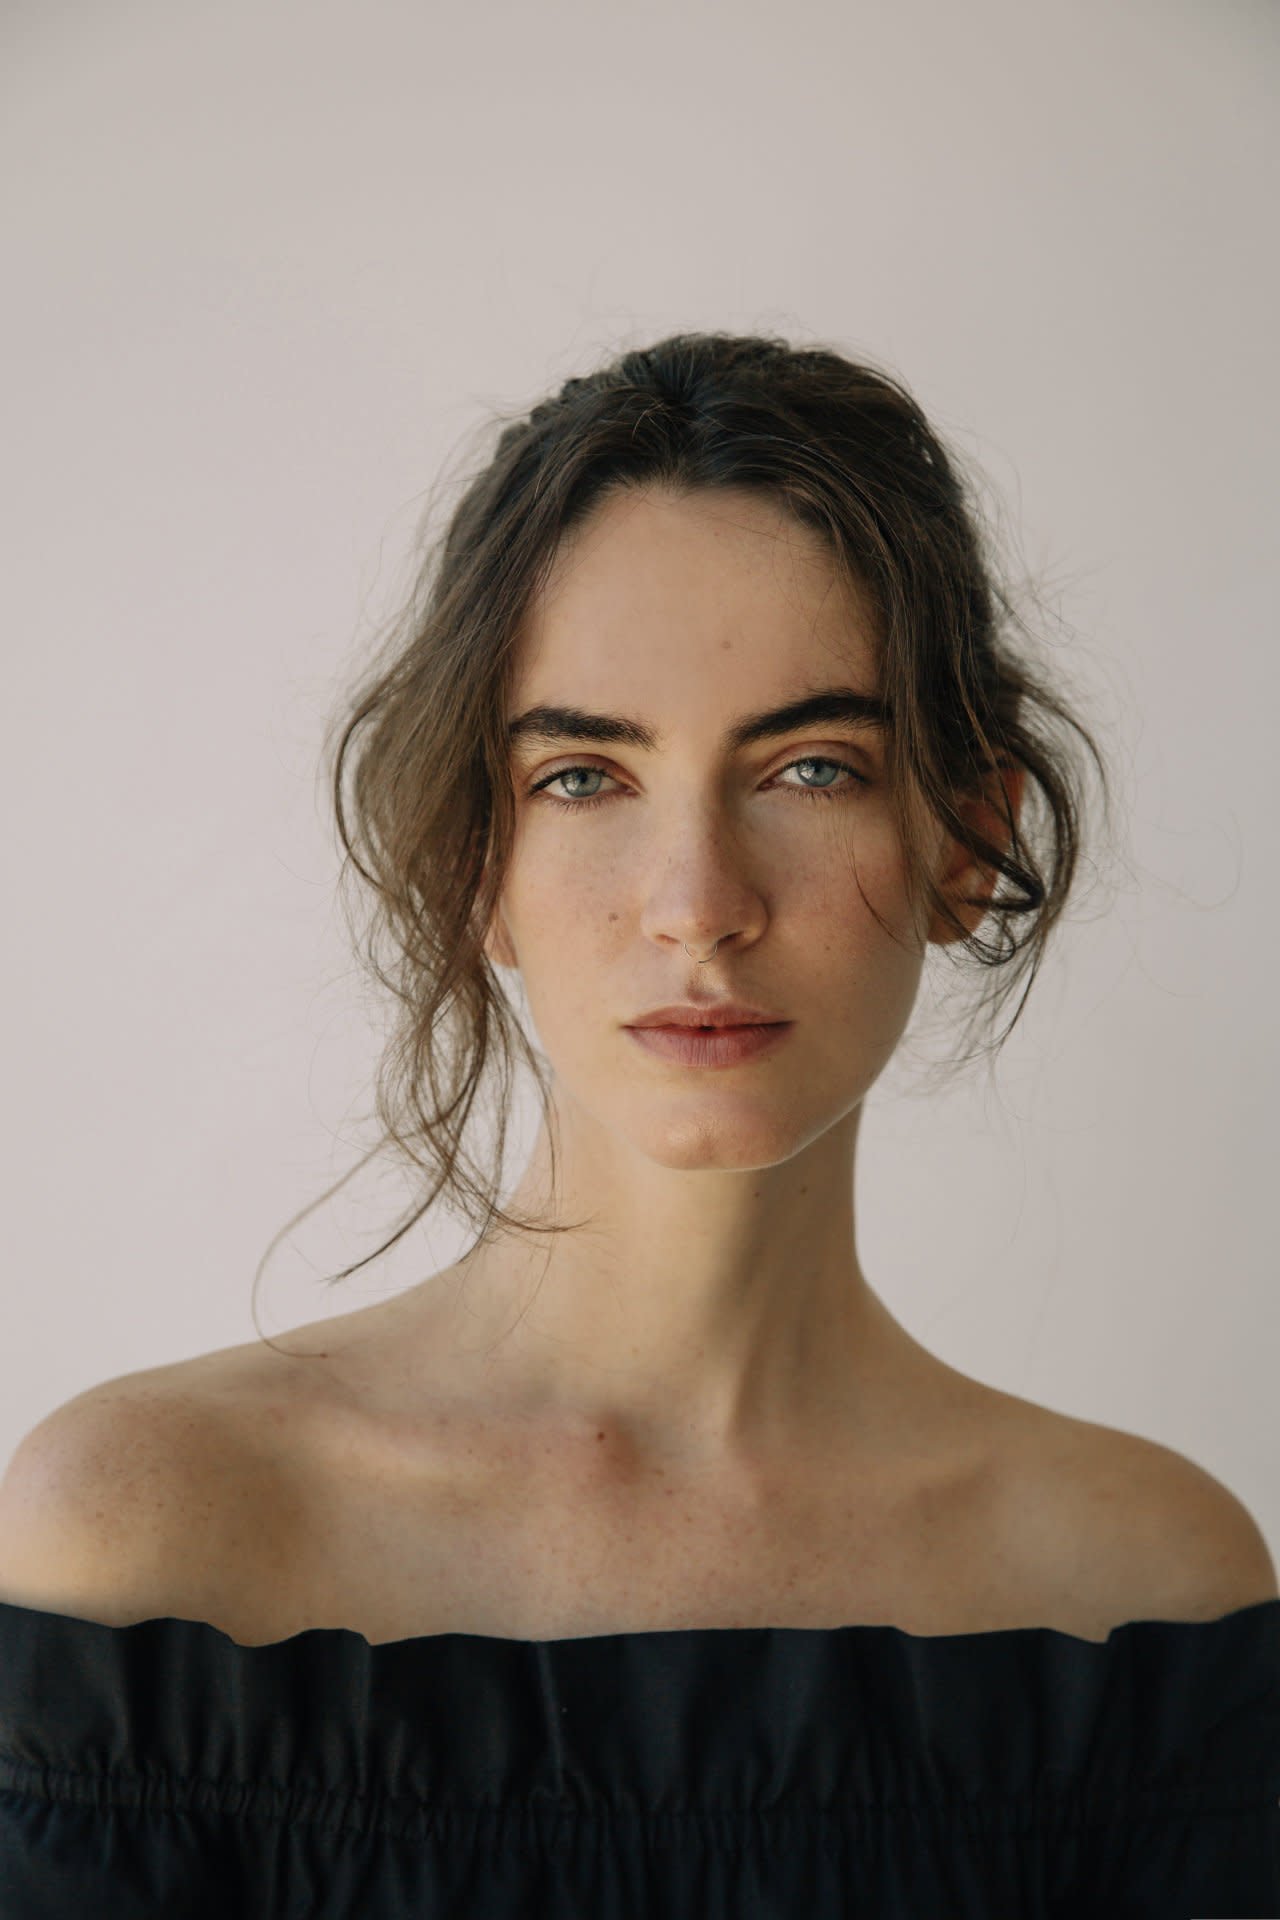 Ana Grebler 19